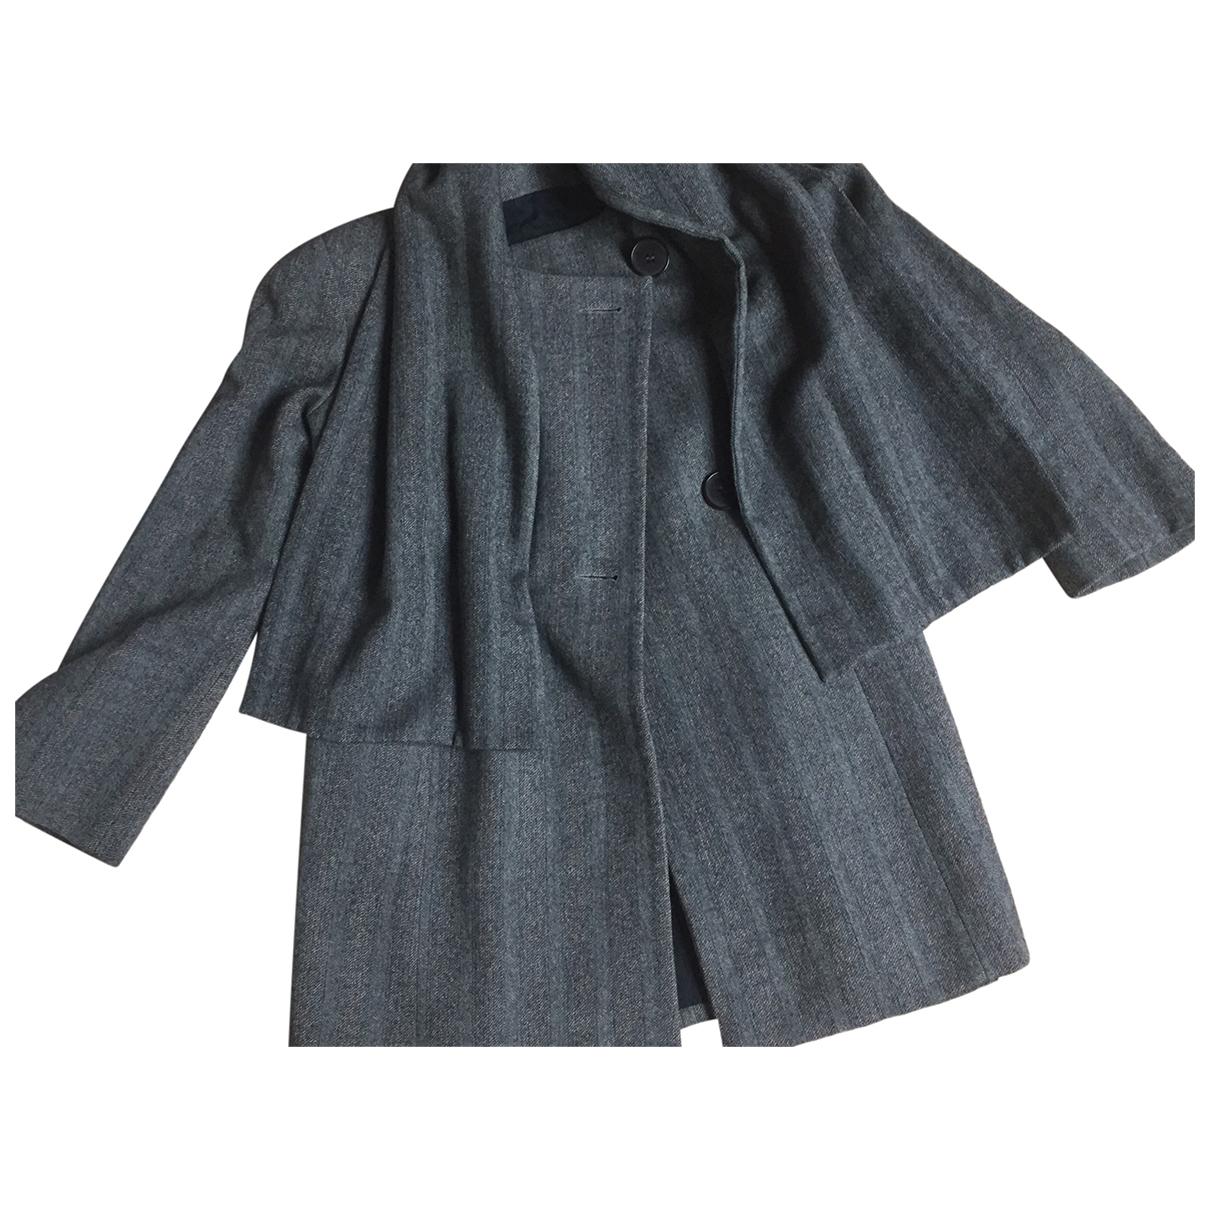 Isabel Marant \N Grey Wool coat for Women 2 0-5